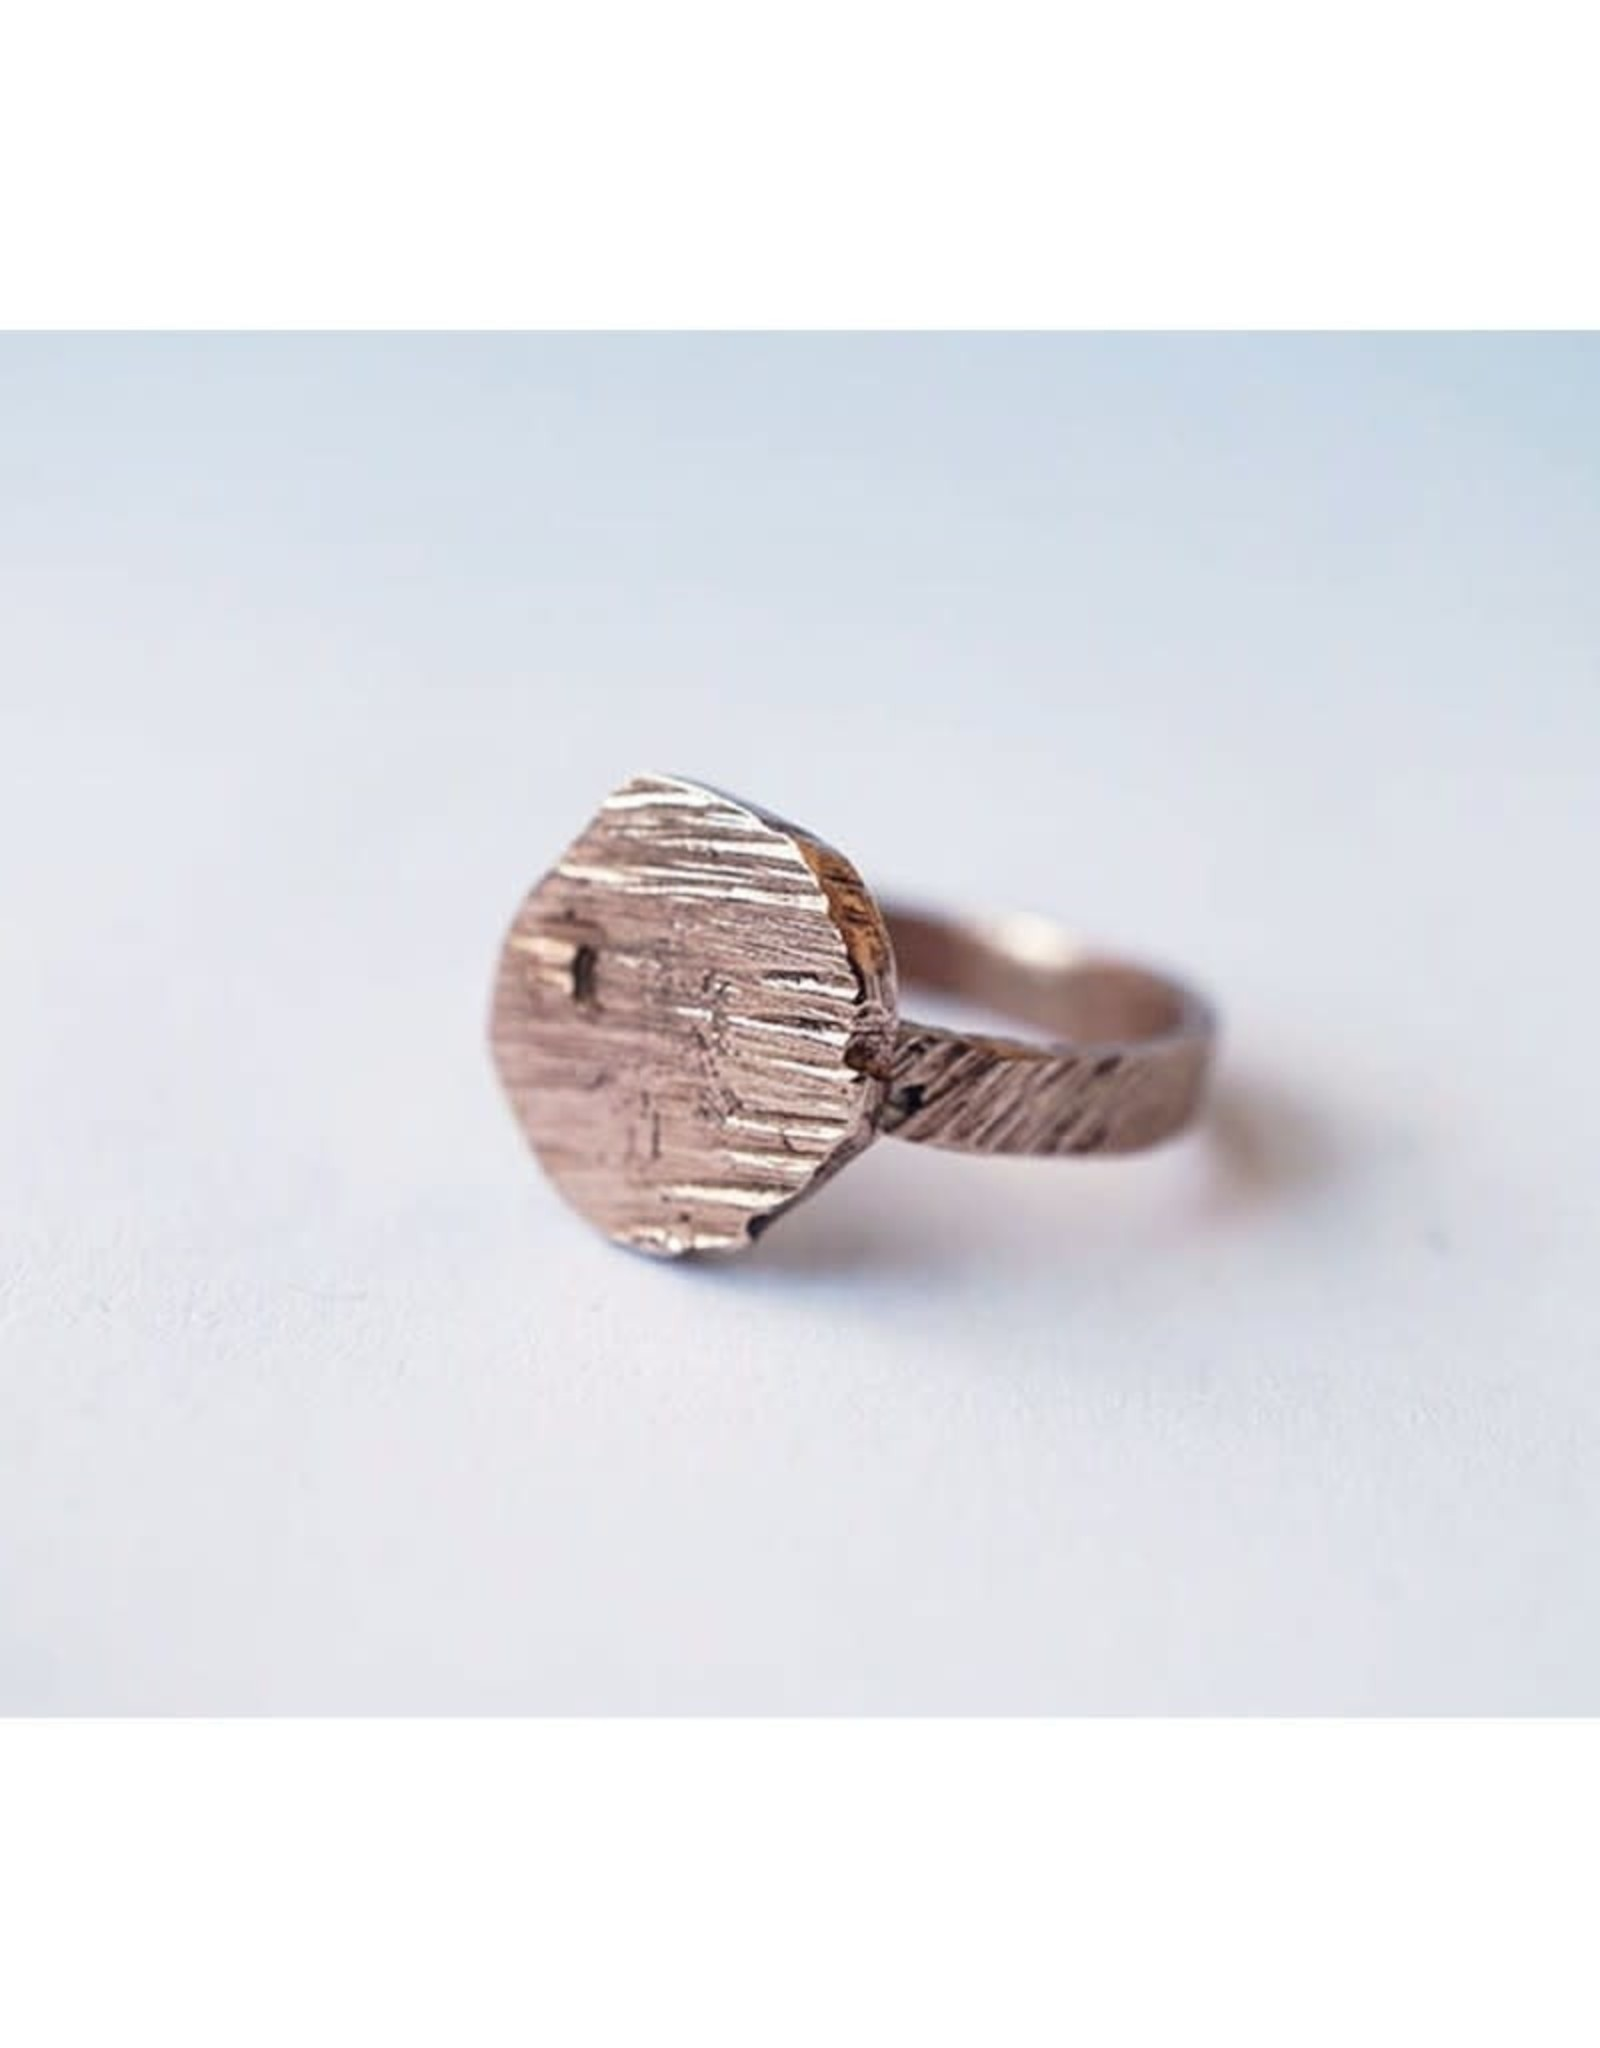 Marmod8 Bague Circle Texture Marmod8 Bronze T5